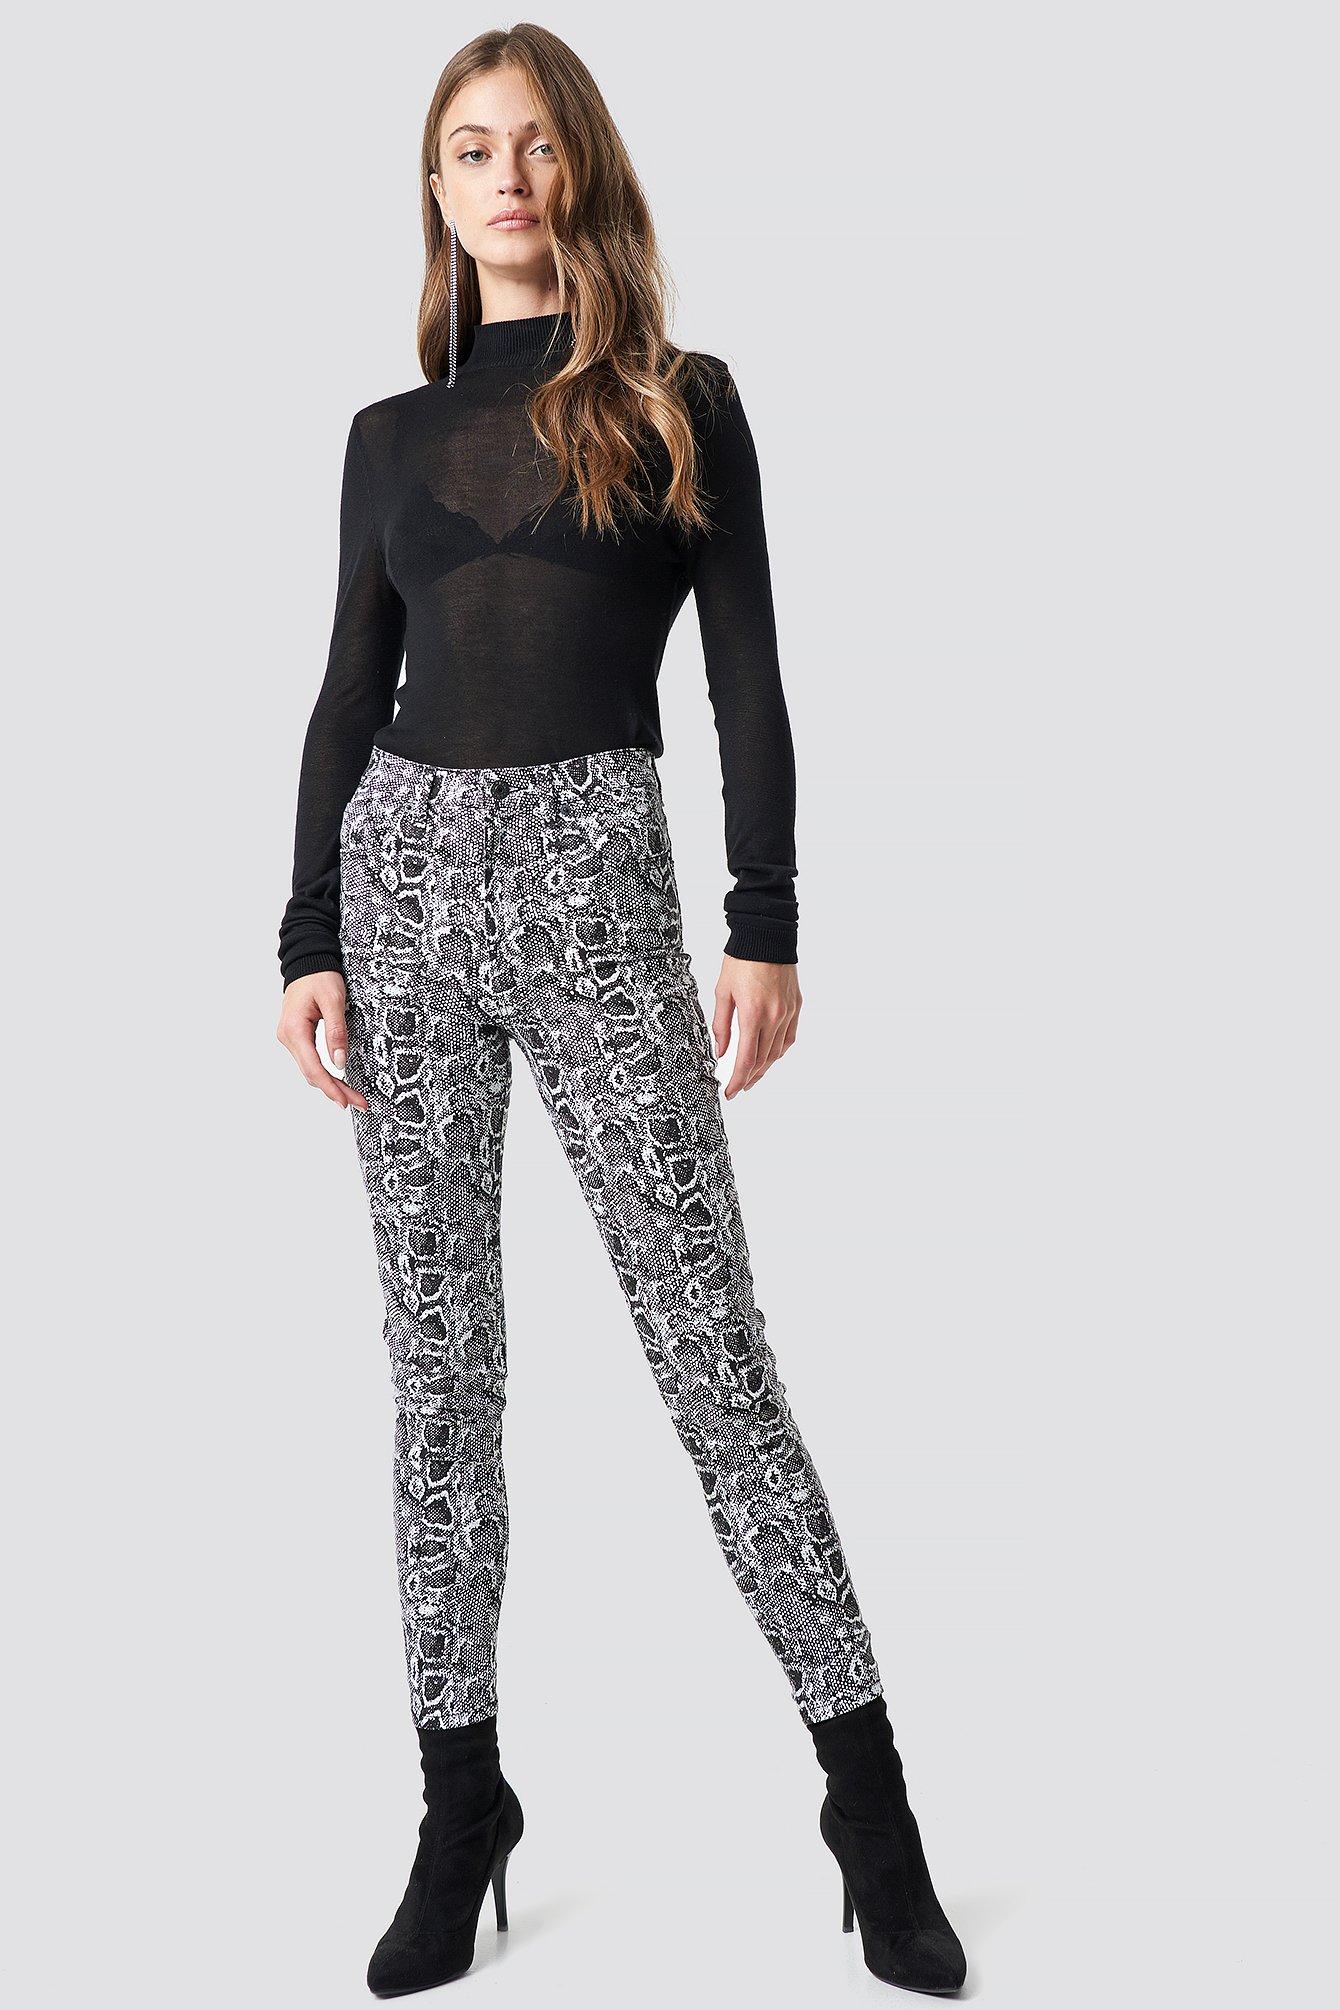 na-kd trend -  Snake Printed Skinny Jeans - Grey,Multicolor